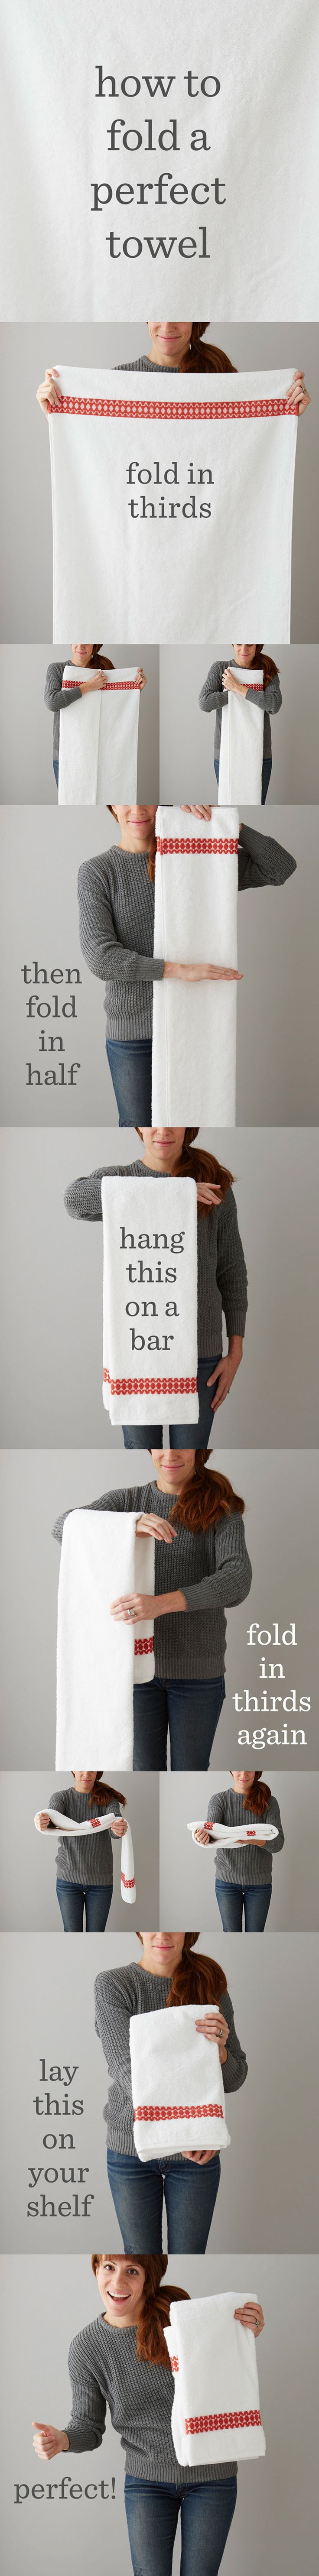 Best 25+ Folding bath towels ideas on Pinterest